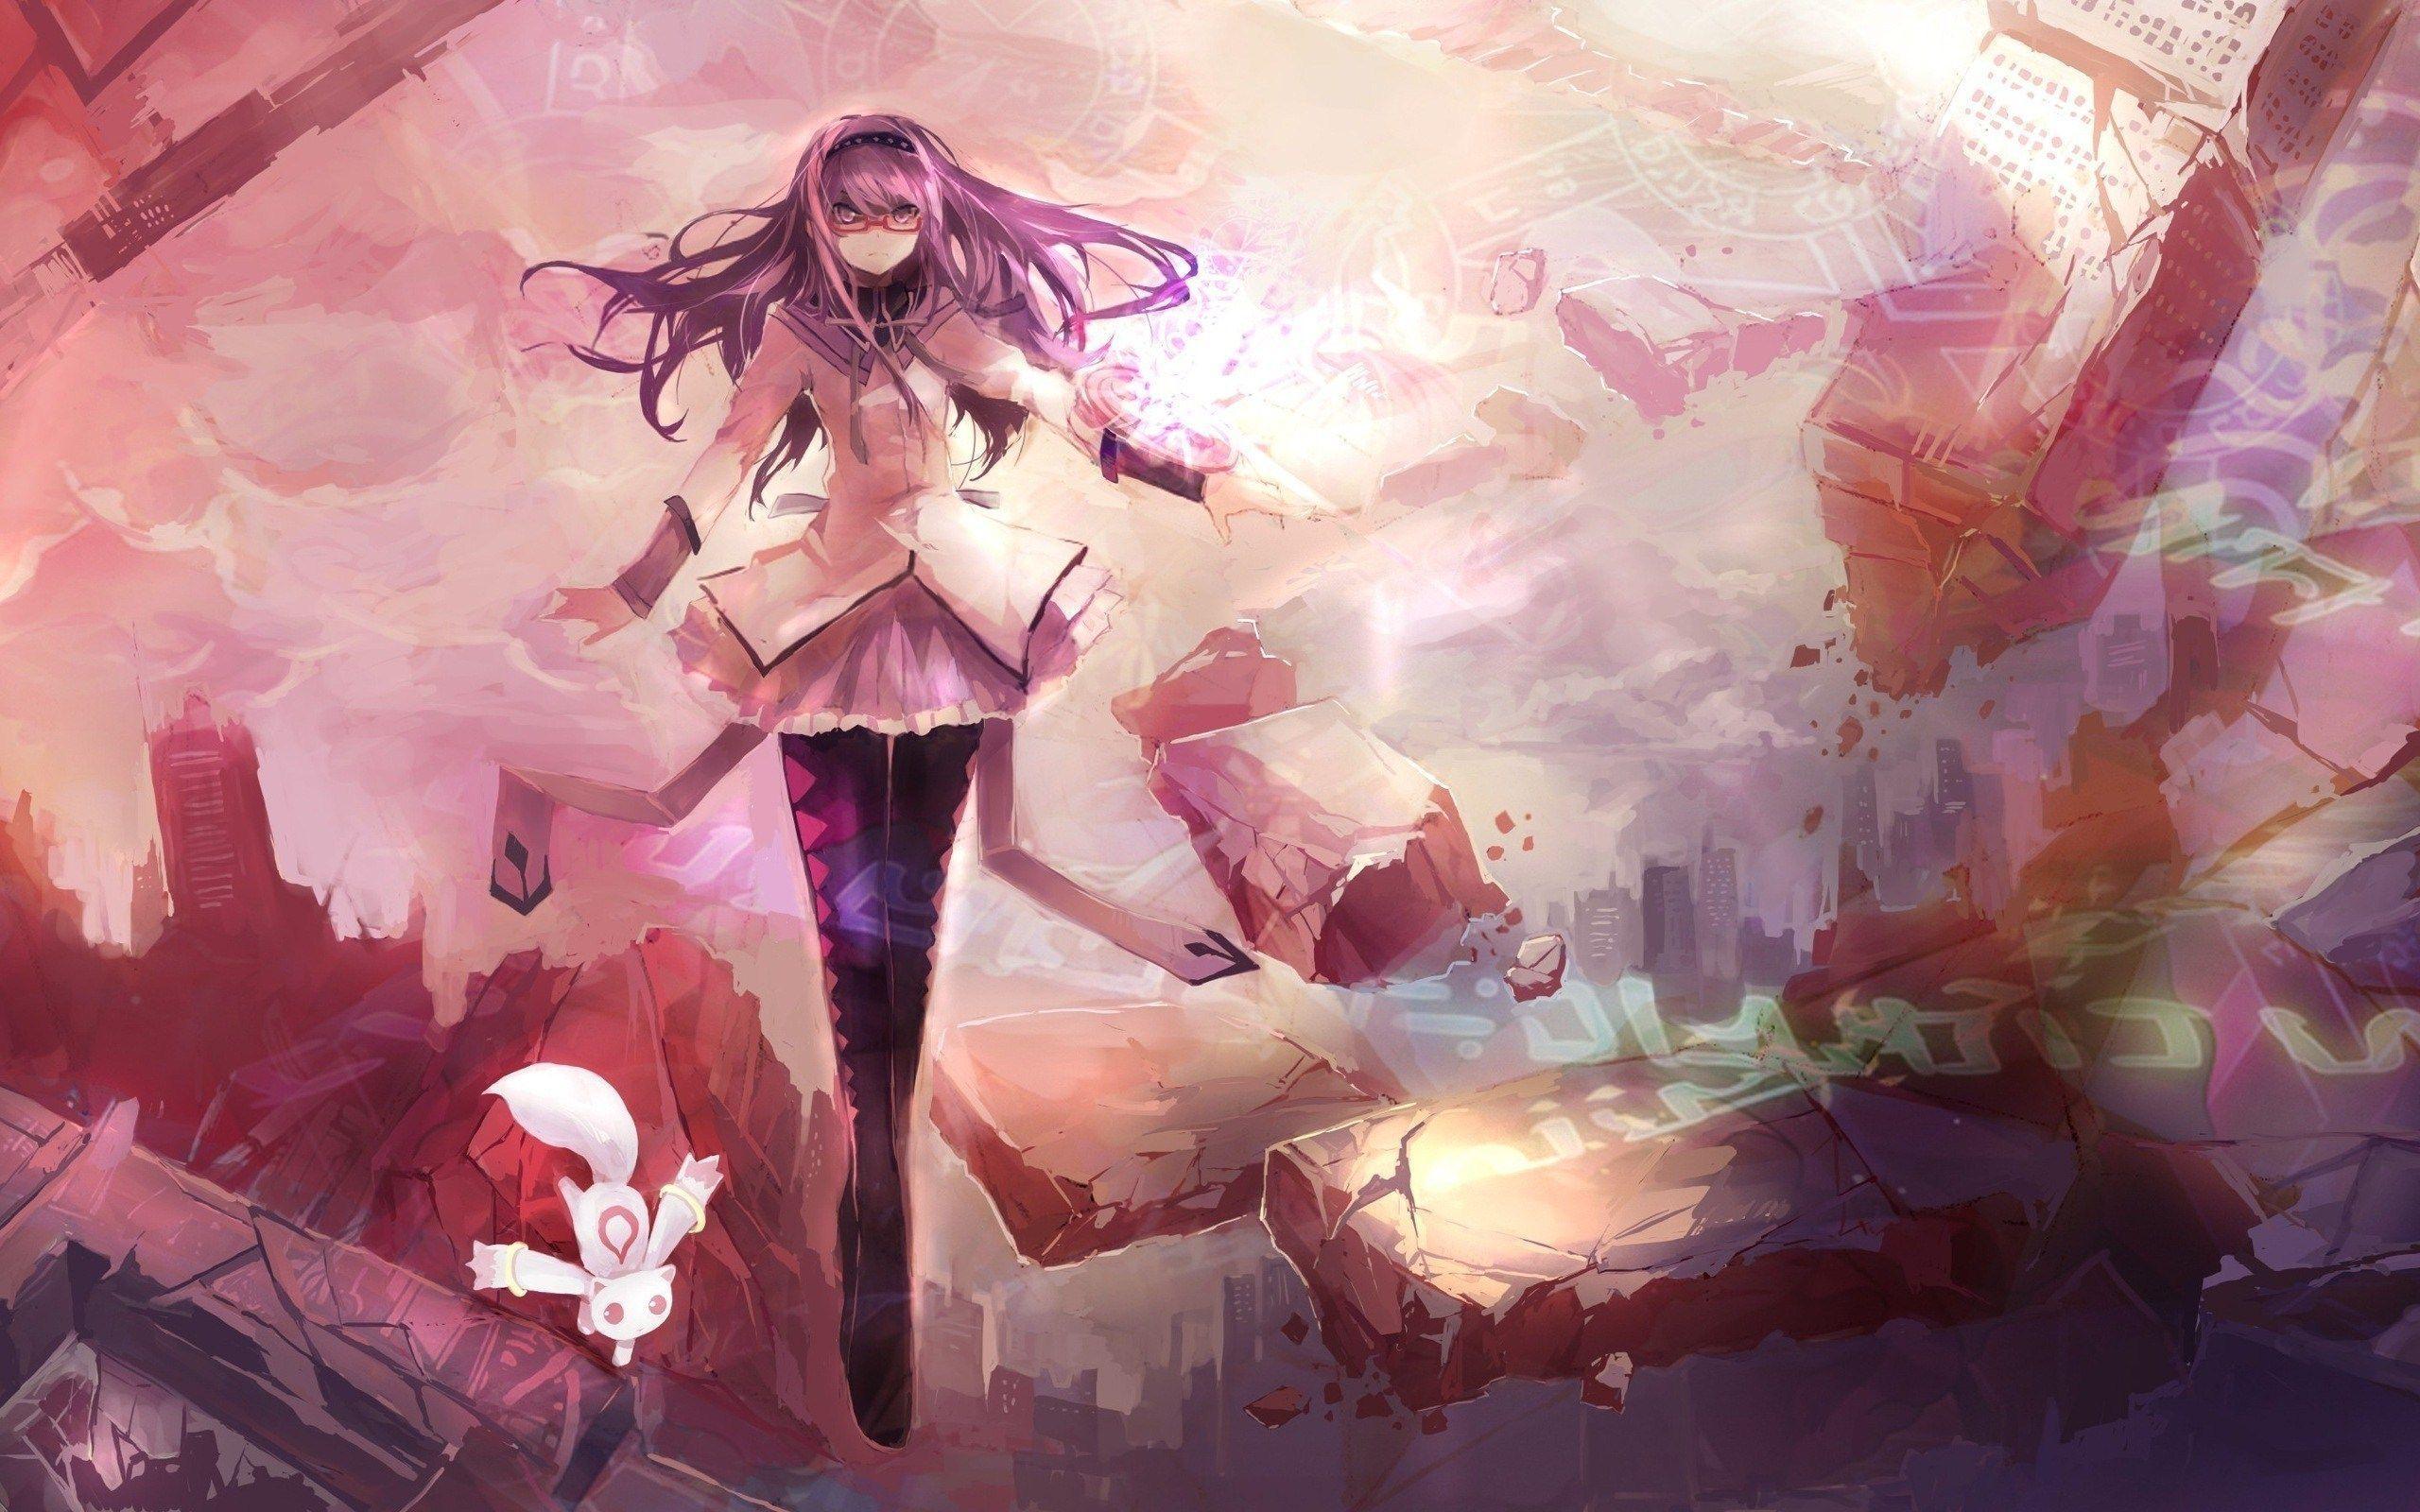 Anime artwork wallpapers top free anime artwork